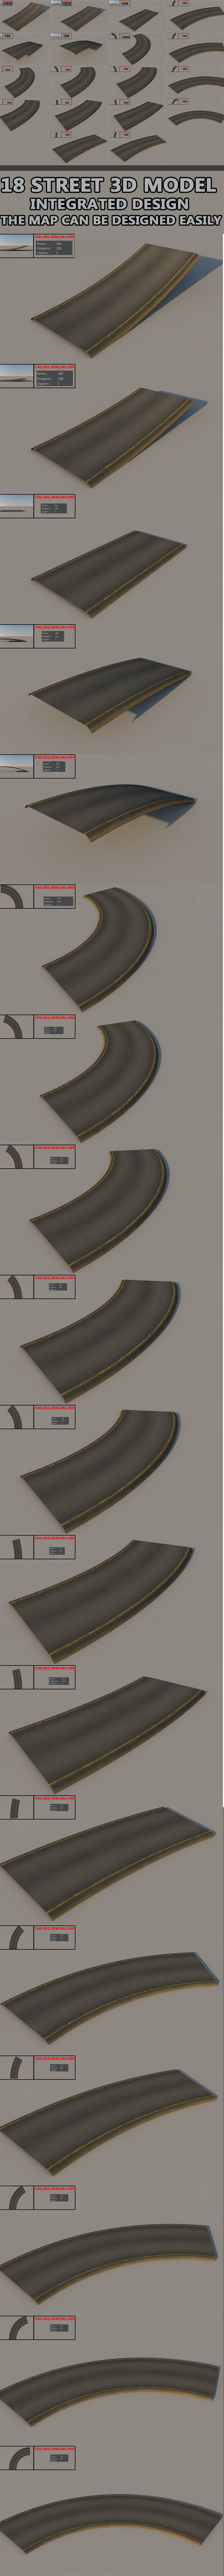 18 Street road - integrated design - 3DOcean Item for Sale